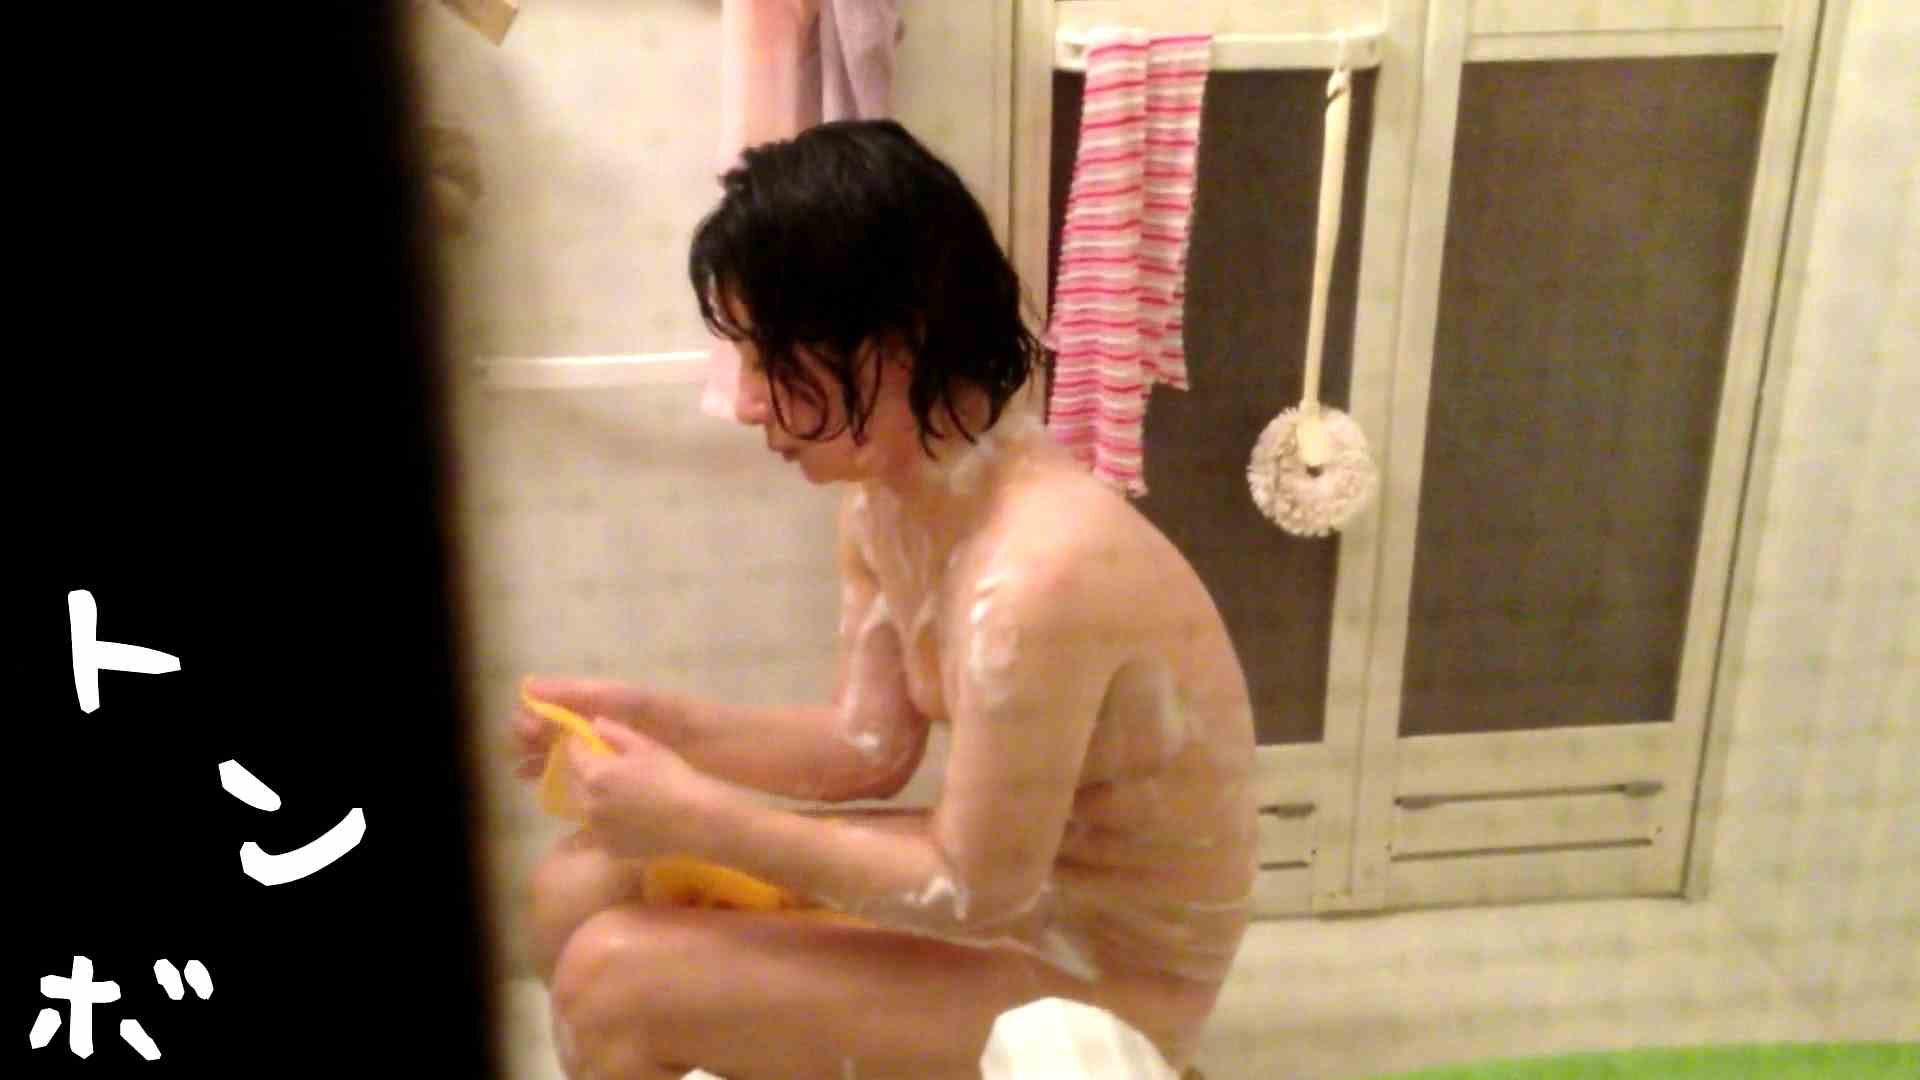 リアル盗撮 美人女市女末の入浴(女末 JD編 美肌 エロ無料画像 80画像 63